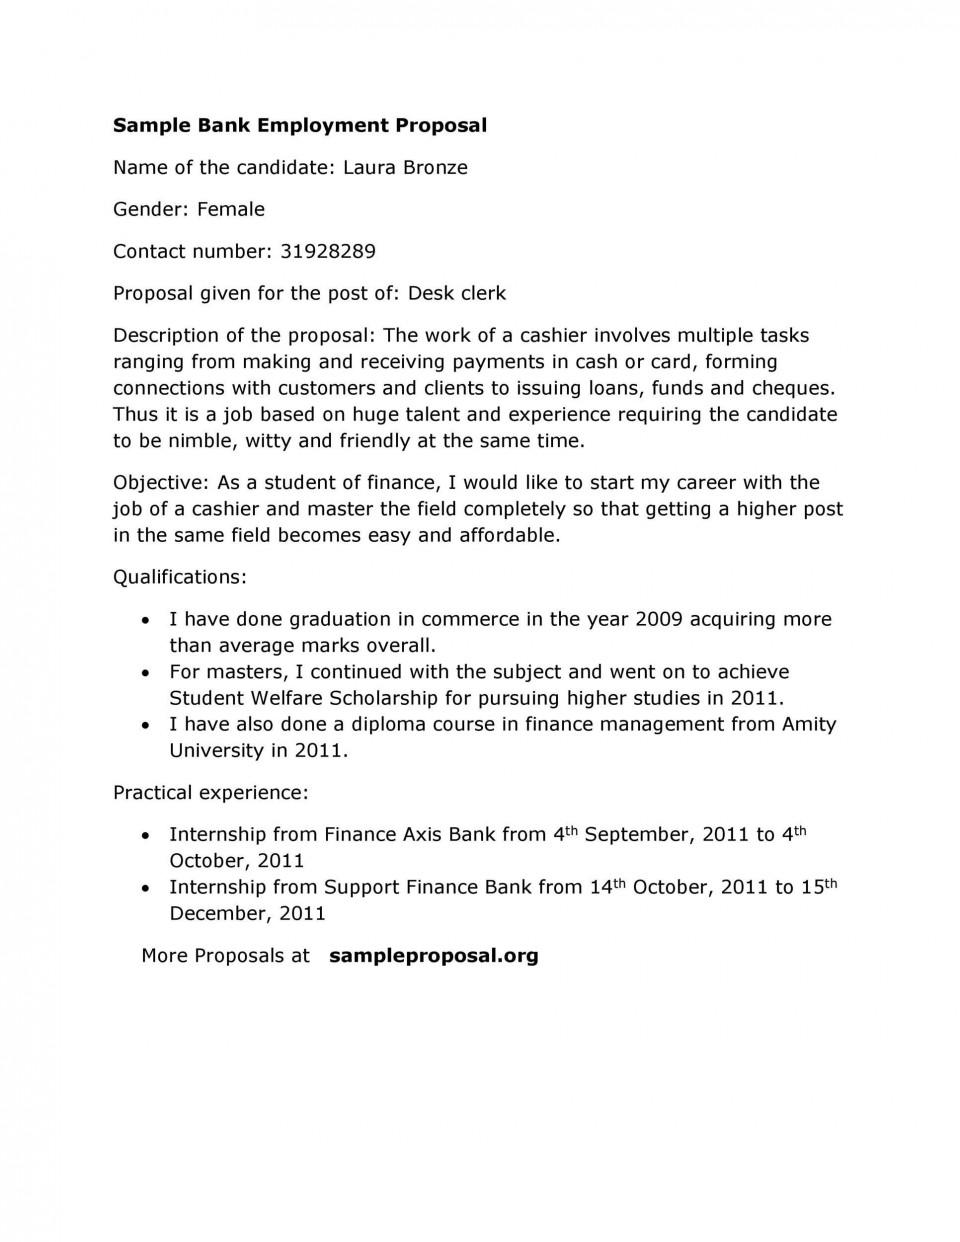 005 Surprising Writing A Job Proposal Template Sample Concept 960